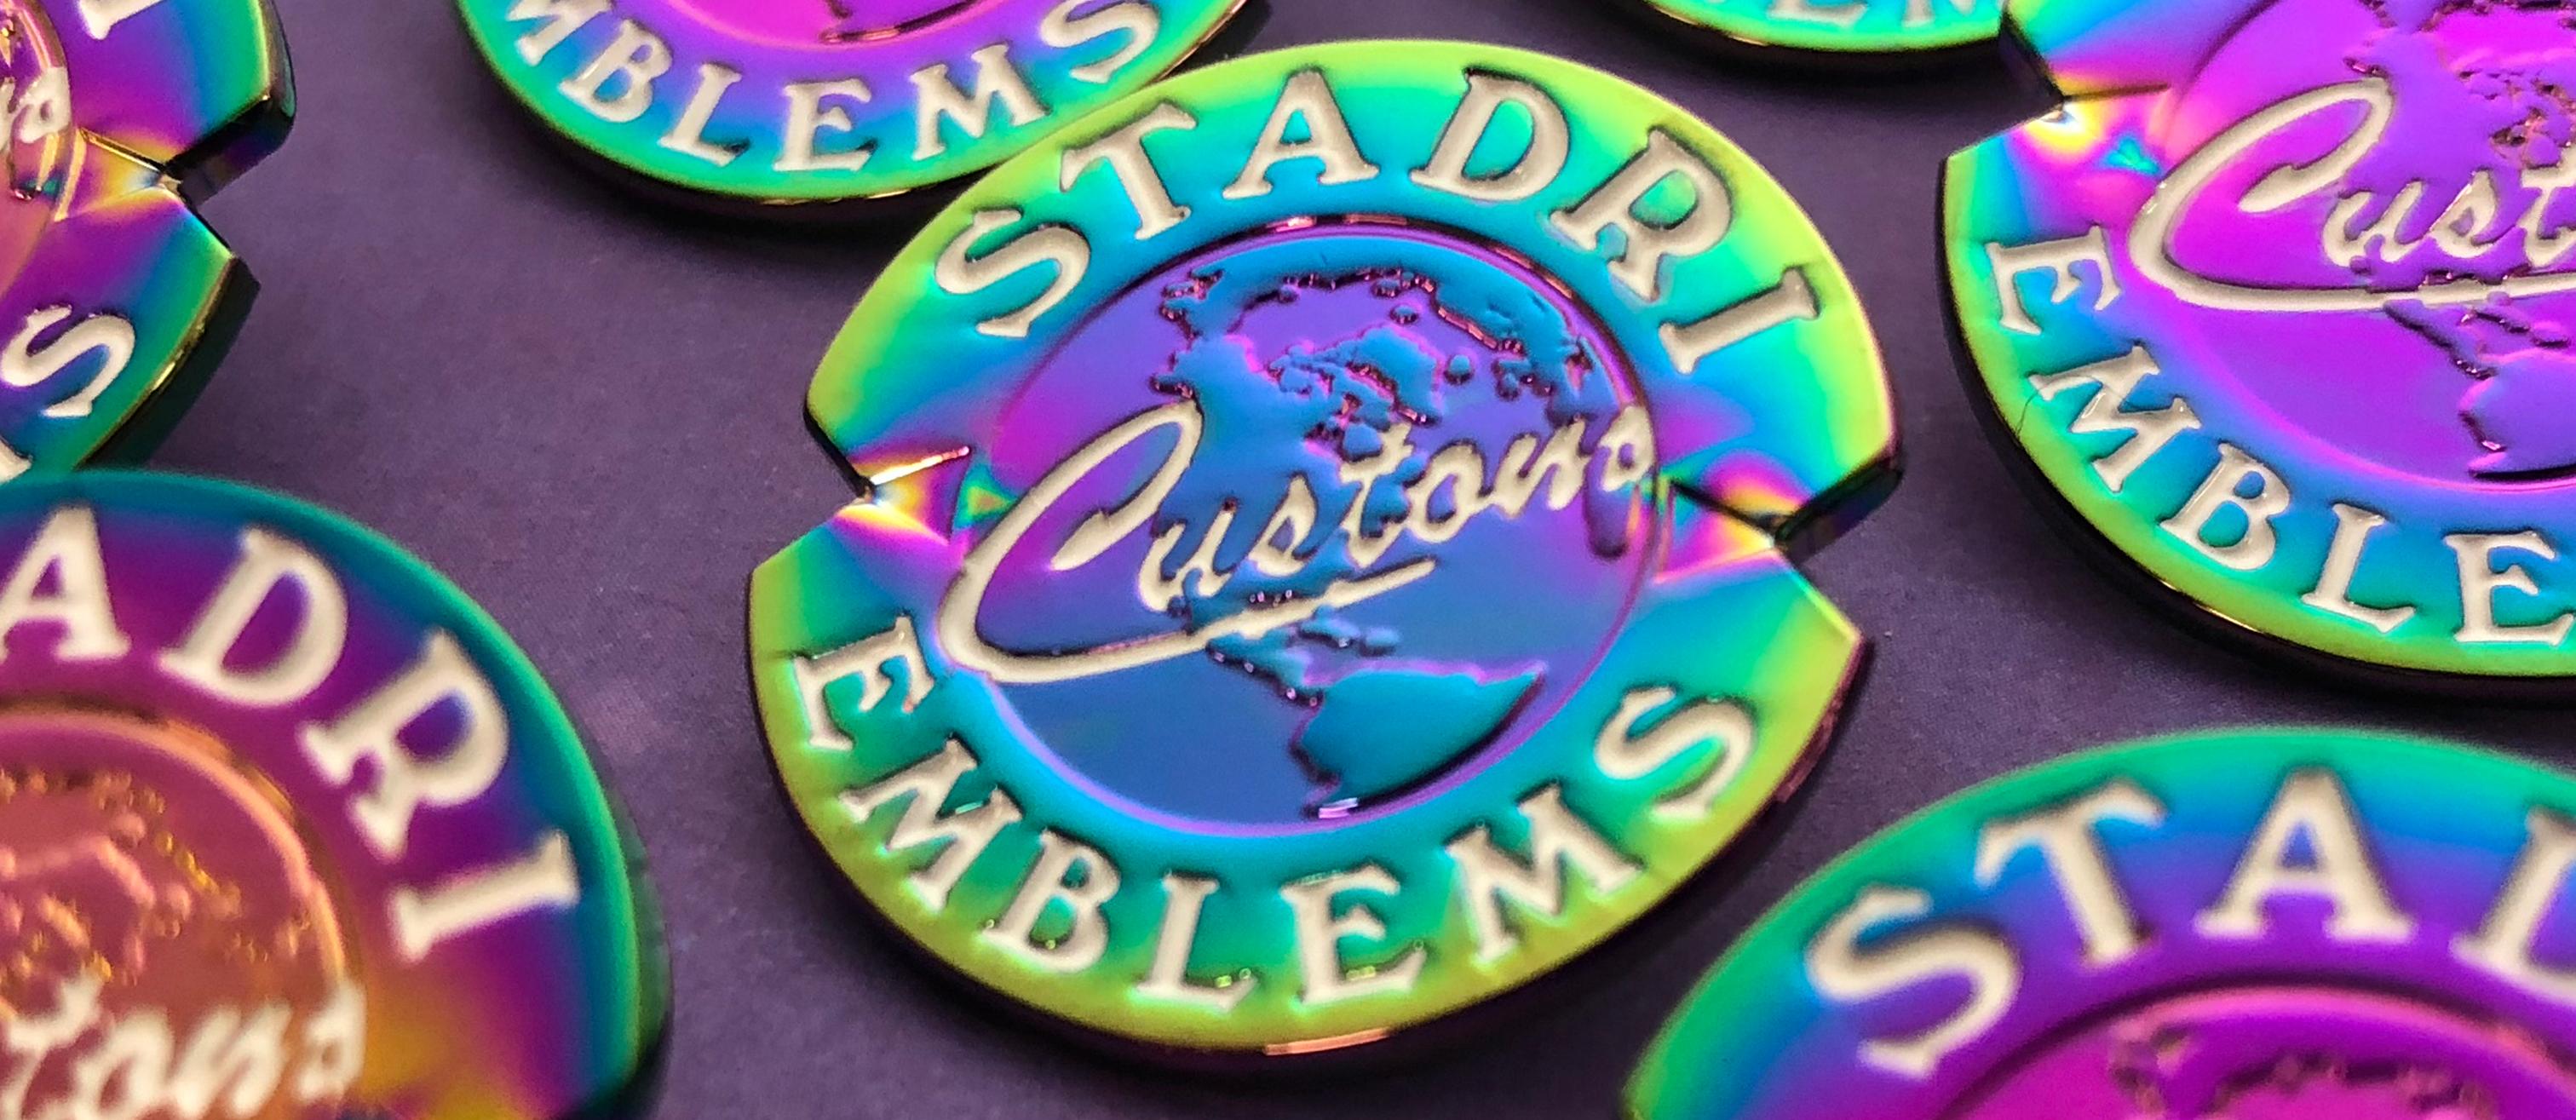 Rainbow metal Stadri logo